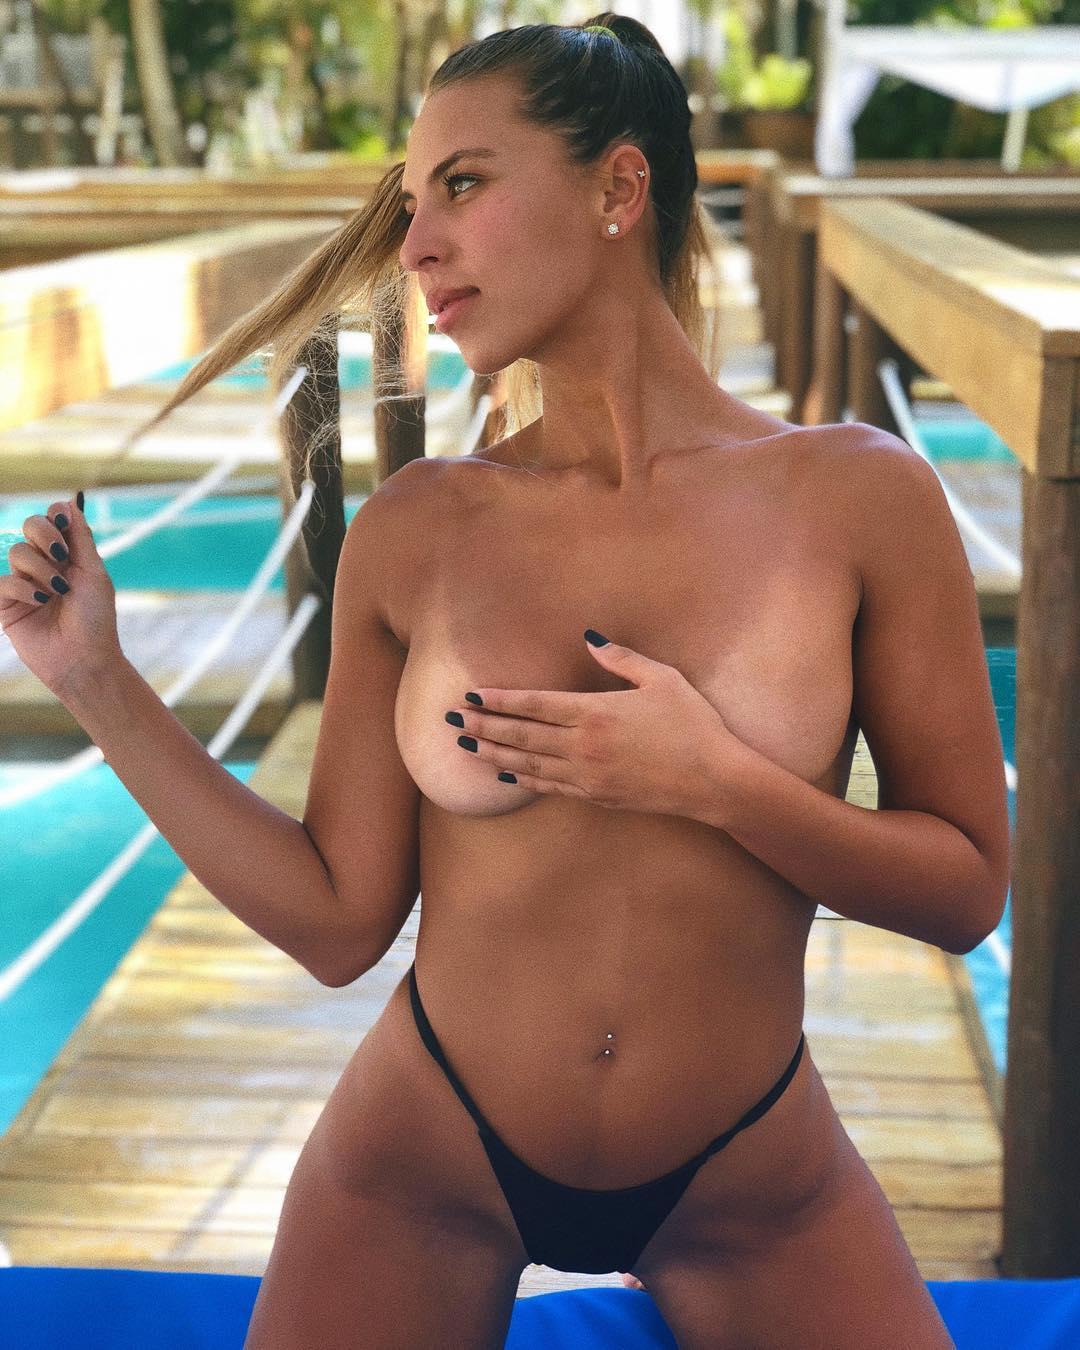 Natalia Garibotto Nude Onlyfans Leaked 0044